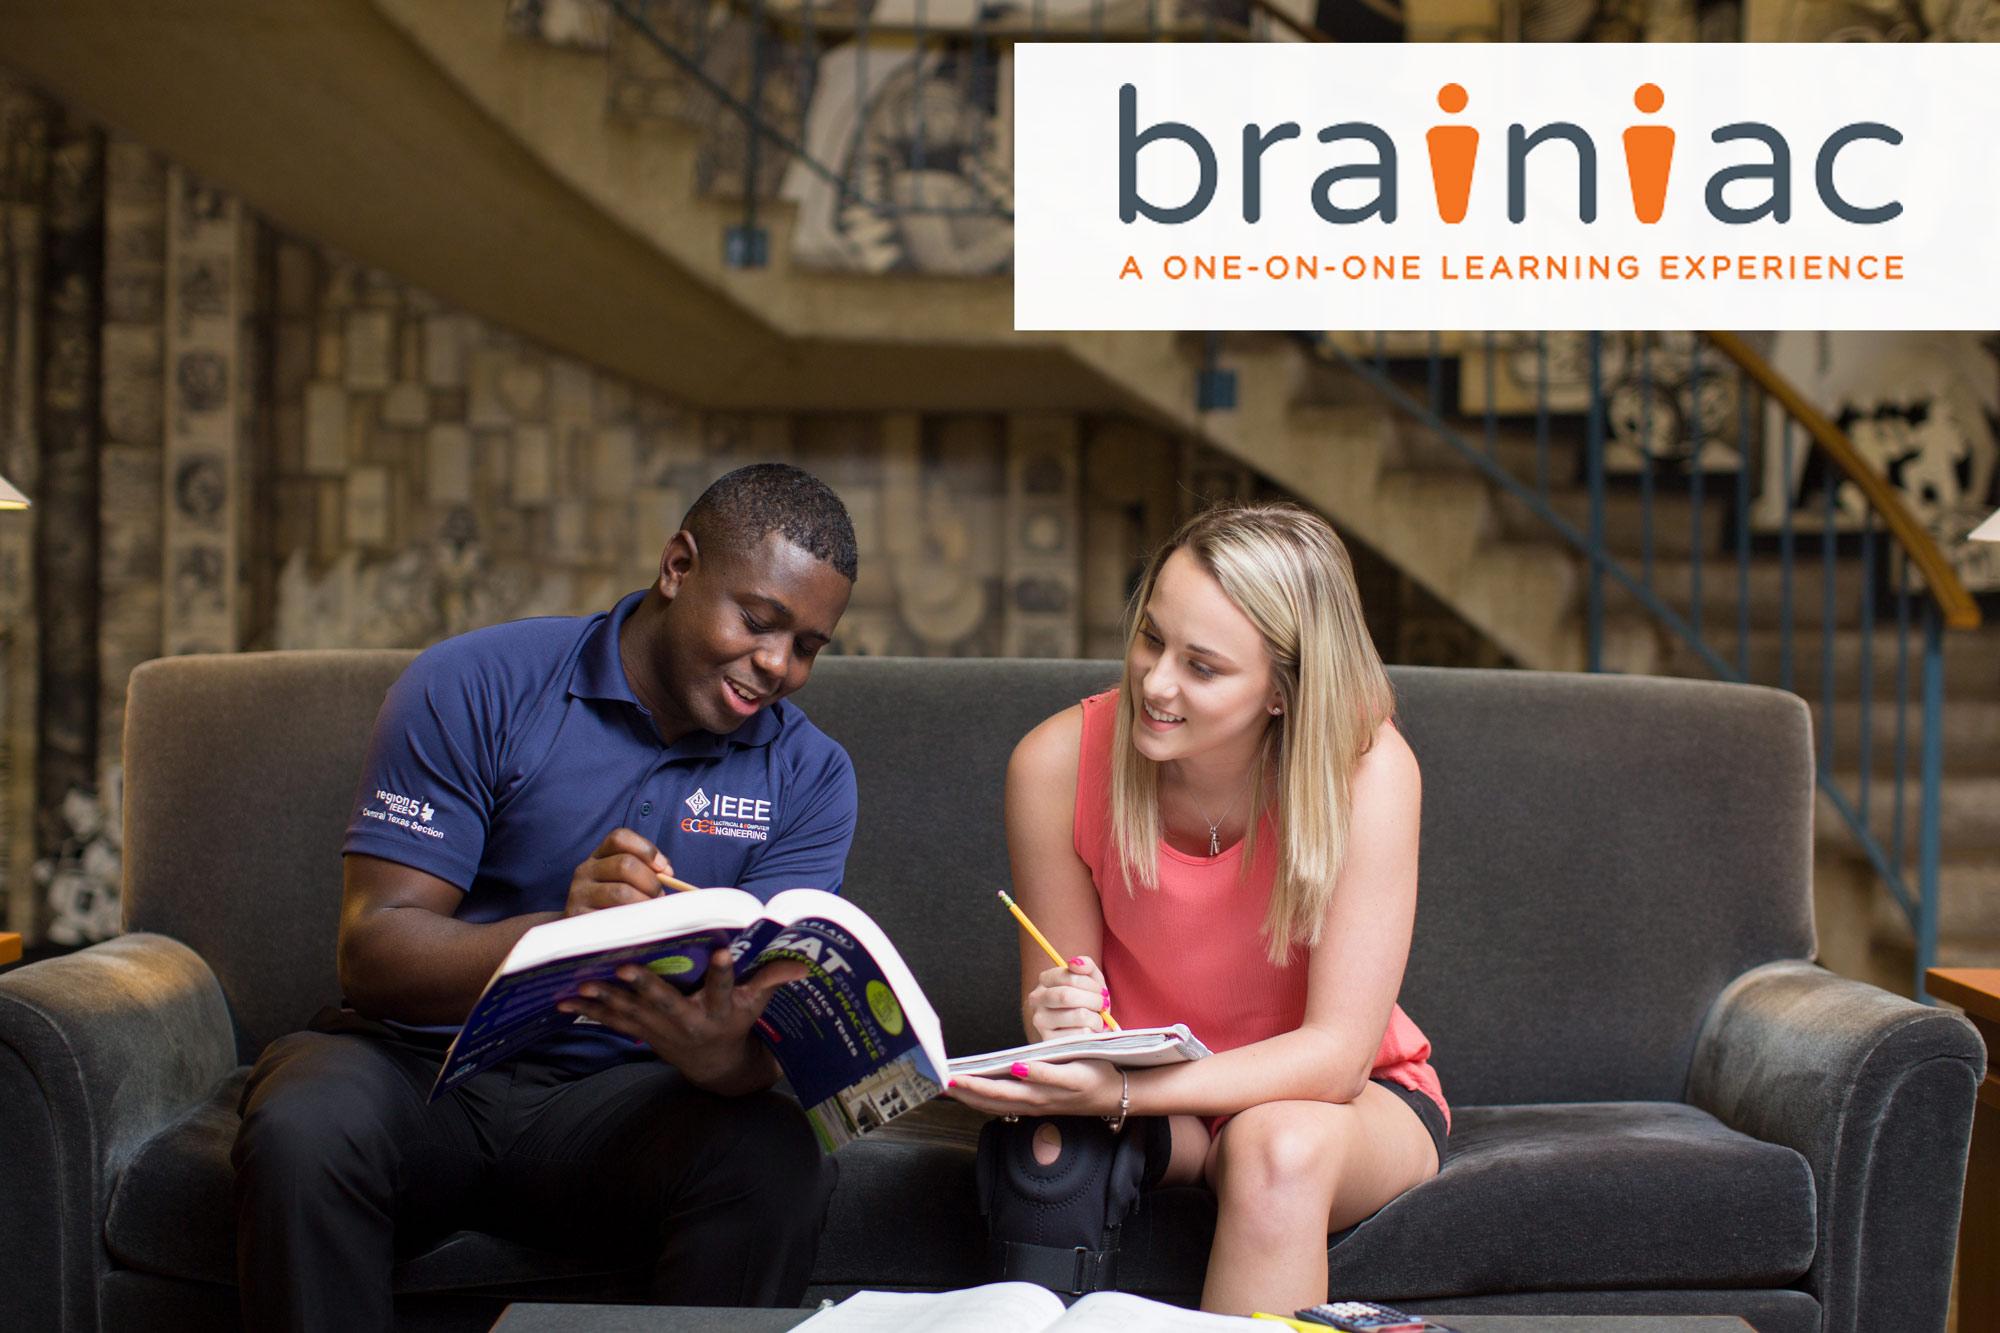 web-Brainiac-Stock-036-071516.jpg